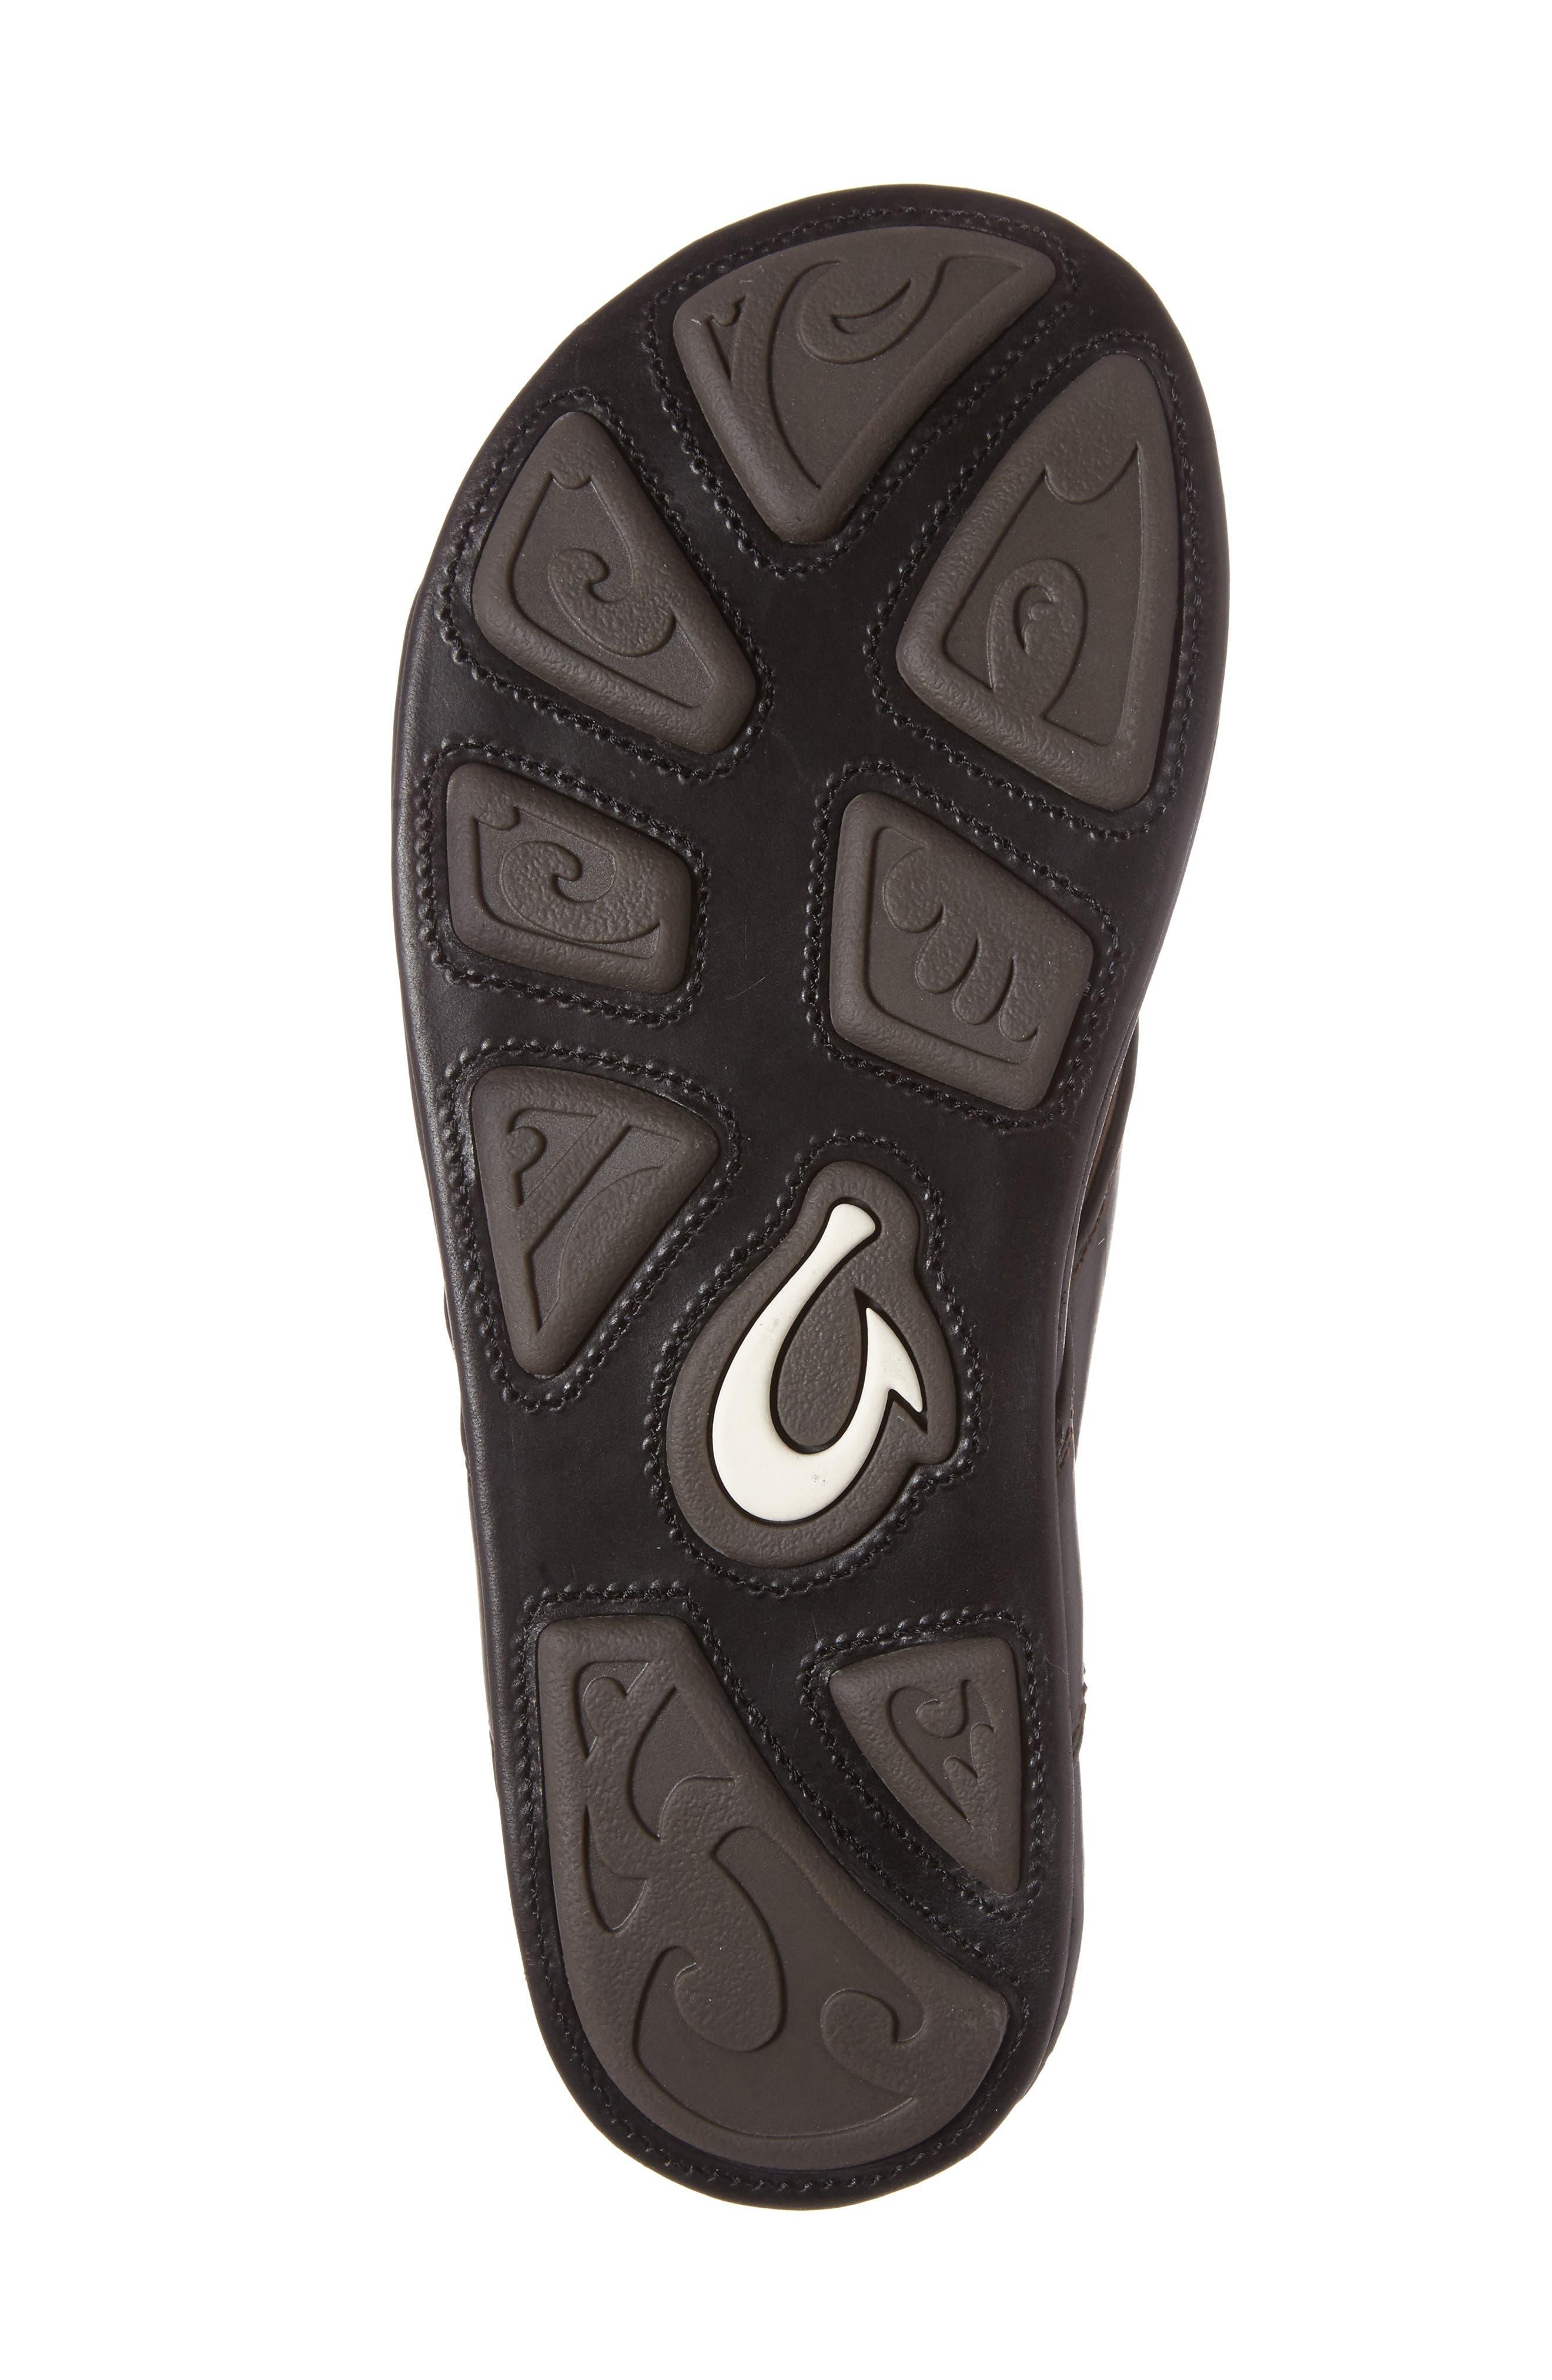 OLUKAI, Waimea Flip Flop, Alternate thumbnail 4, color, BLACK/ BLACK LEATHER